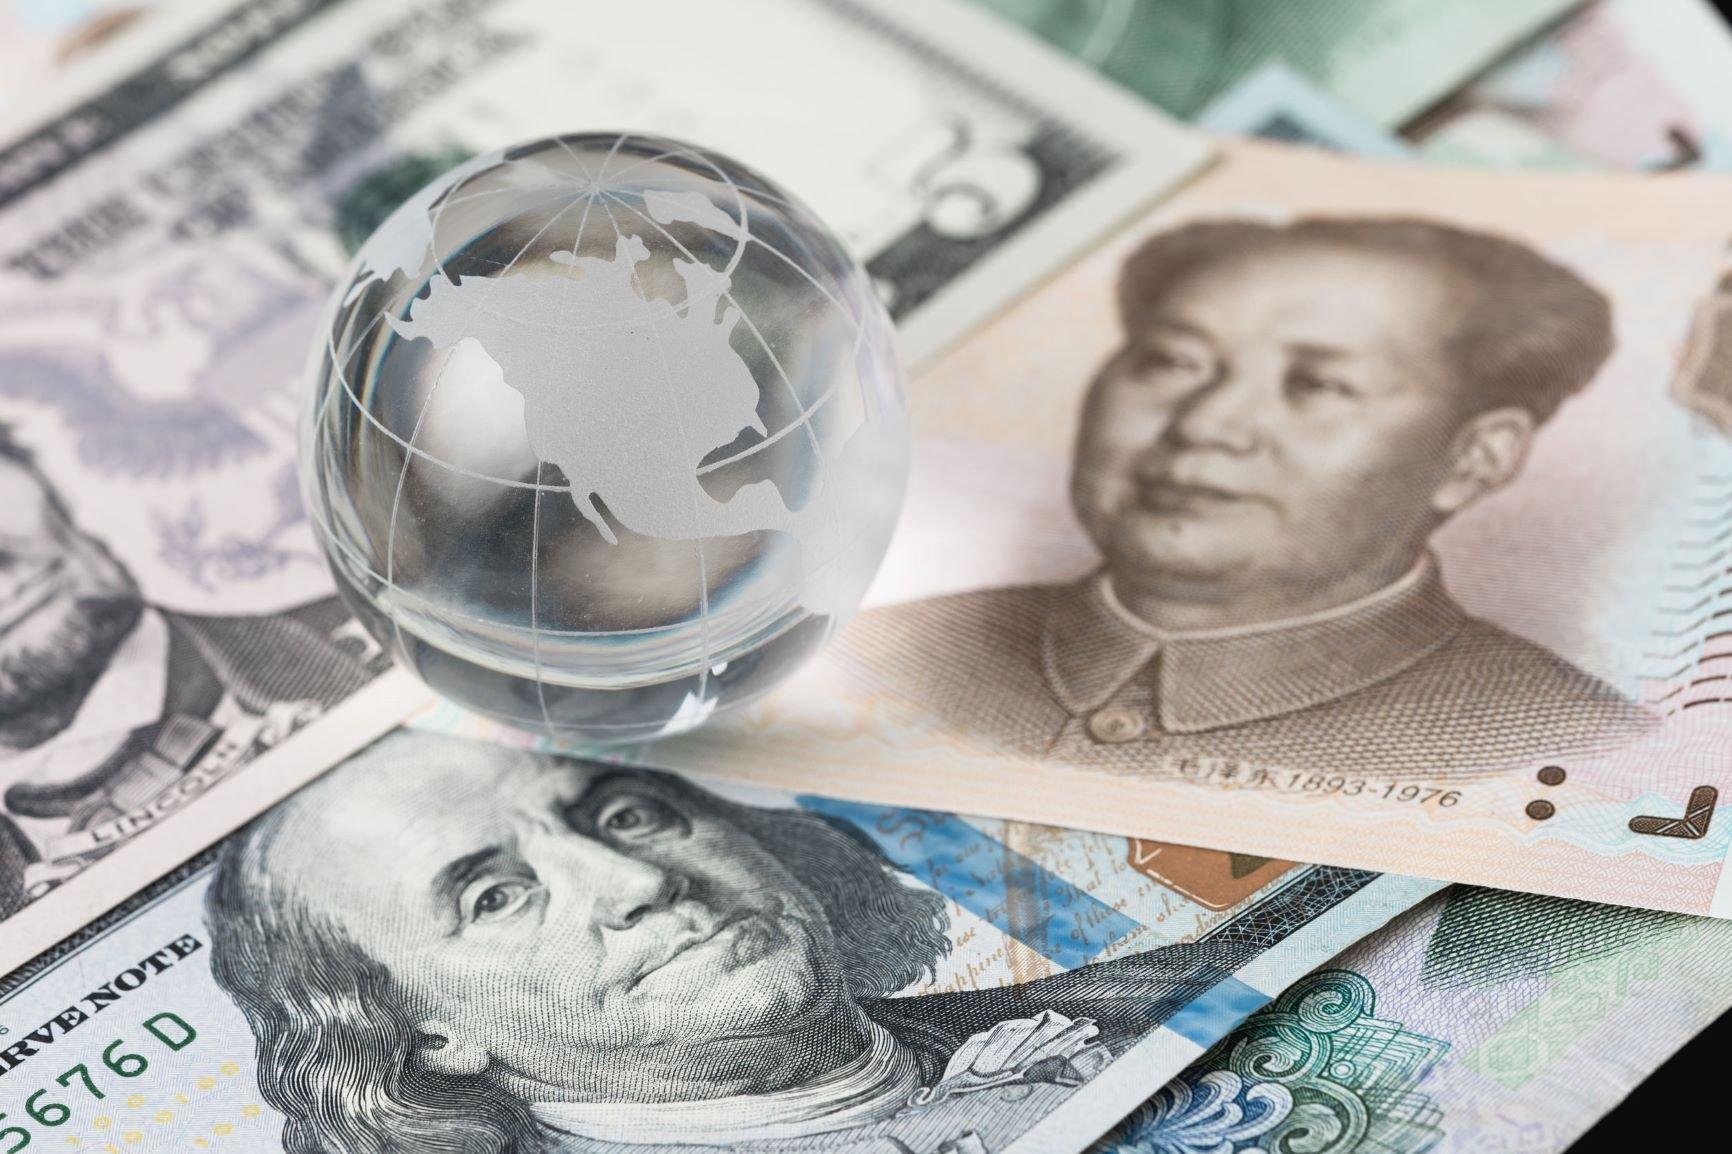 dampak perang dagang, resesi ekonomi, perang dagang AS-Tiongkok, neraca dagang, cad